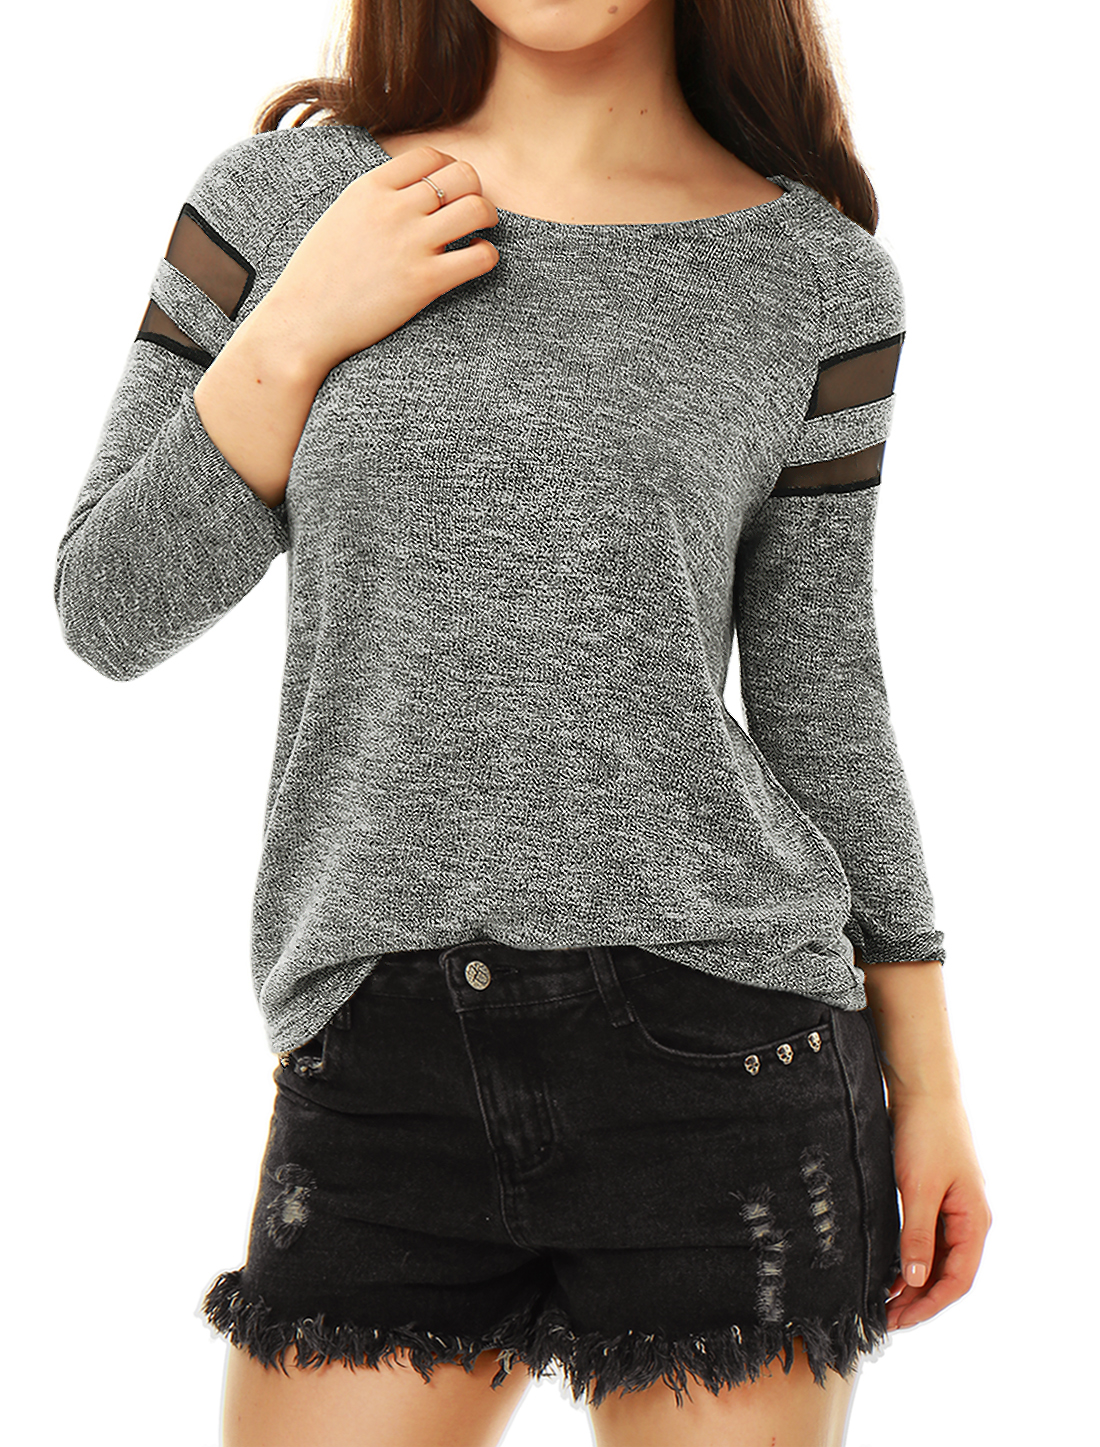 Allegra K Women Mesh Panel Raglan Sleeve Scoop Neck Leisure Tee Heather Gray M